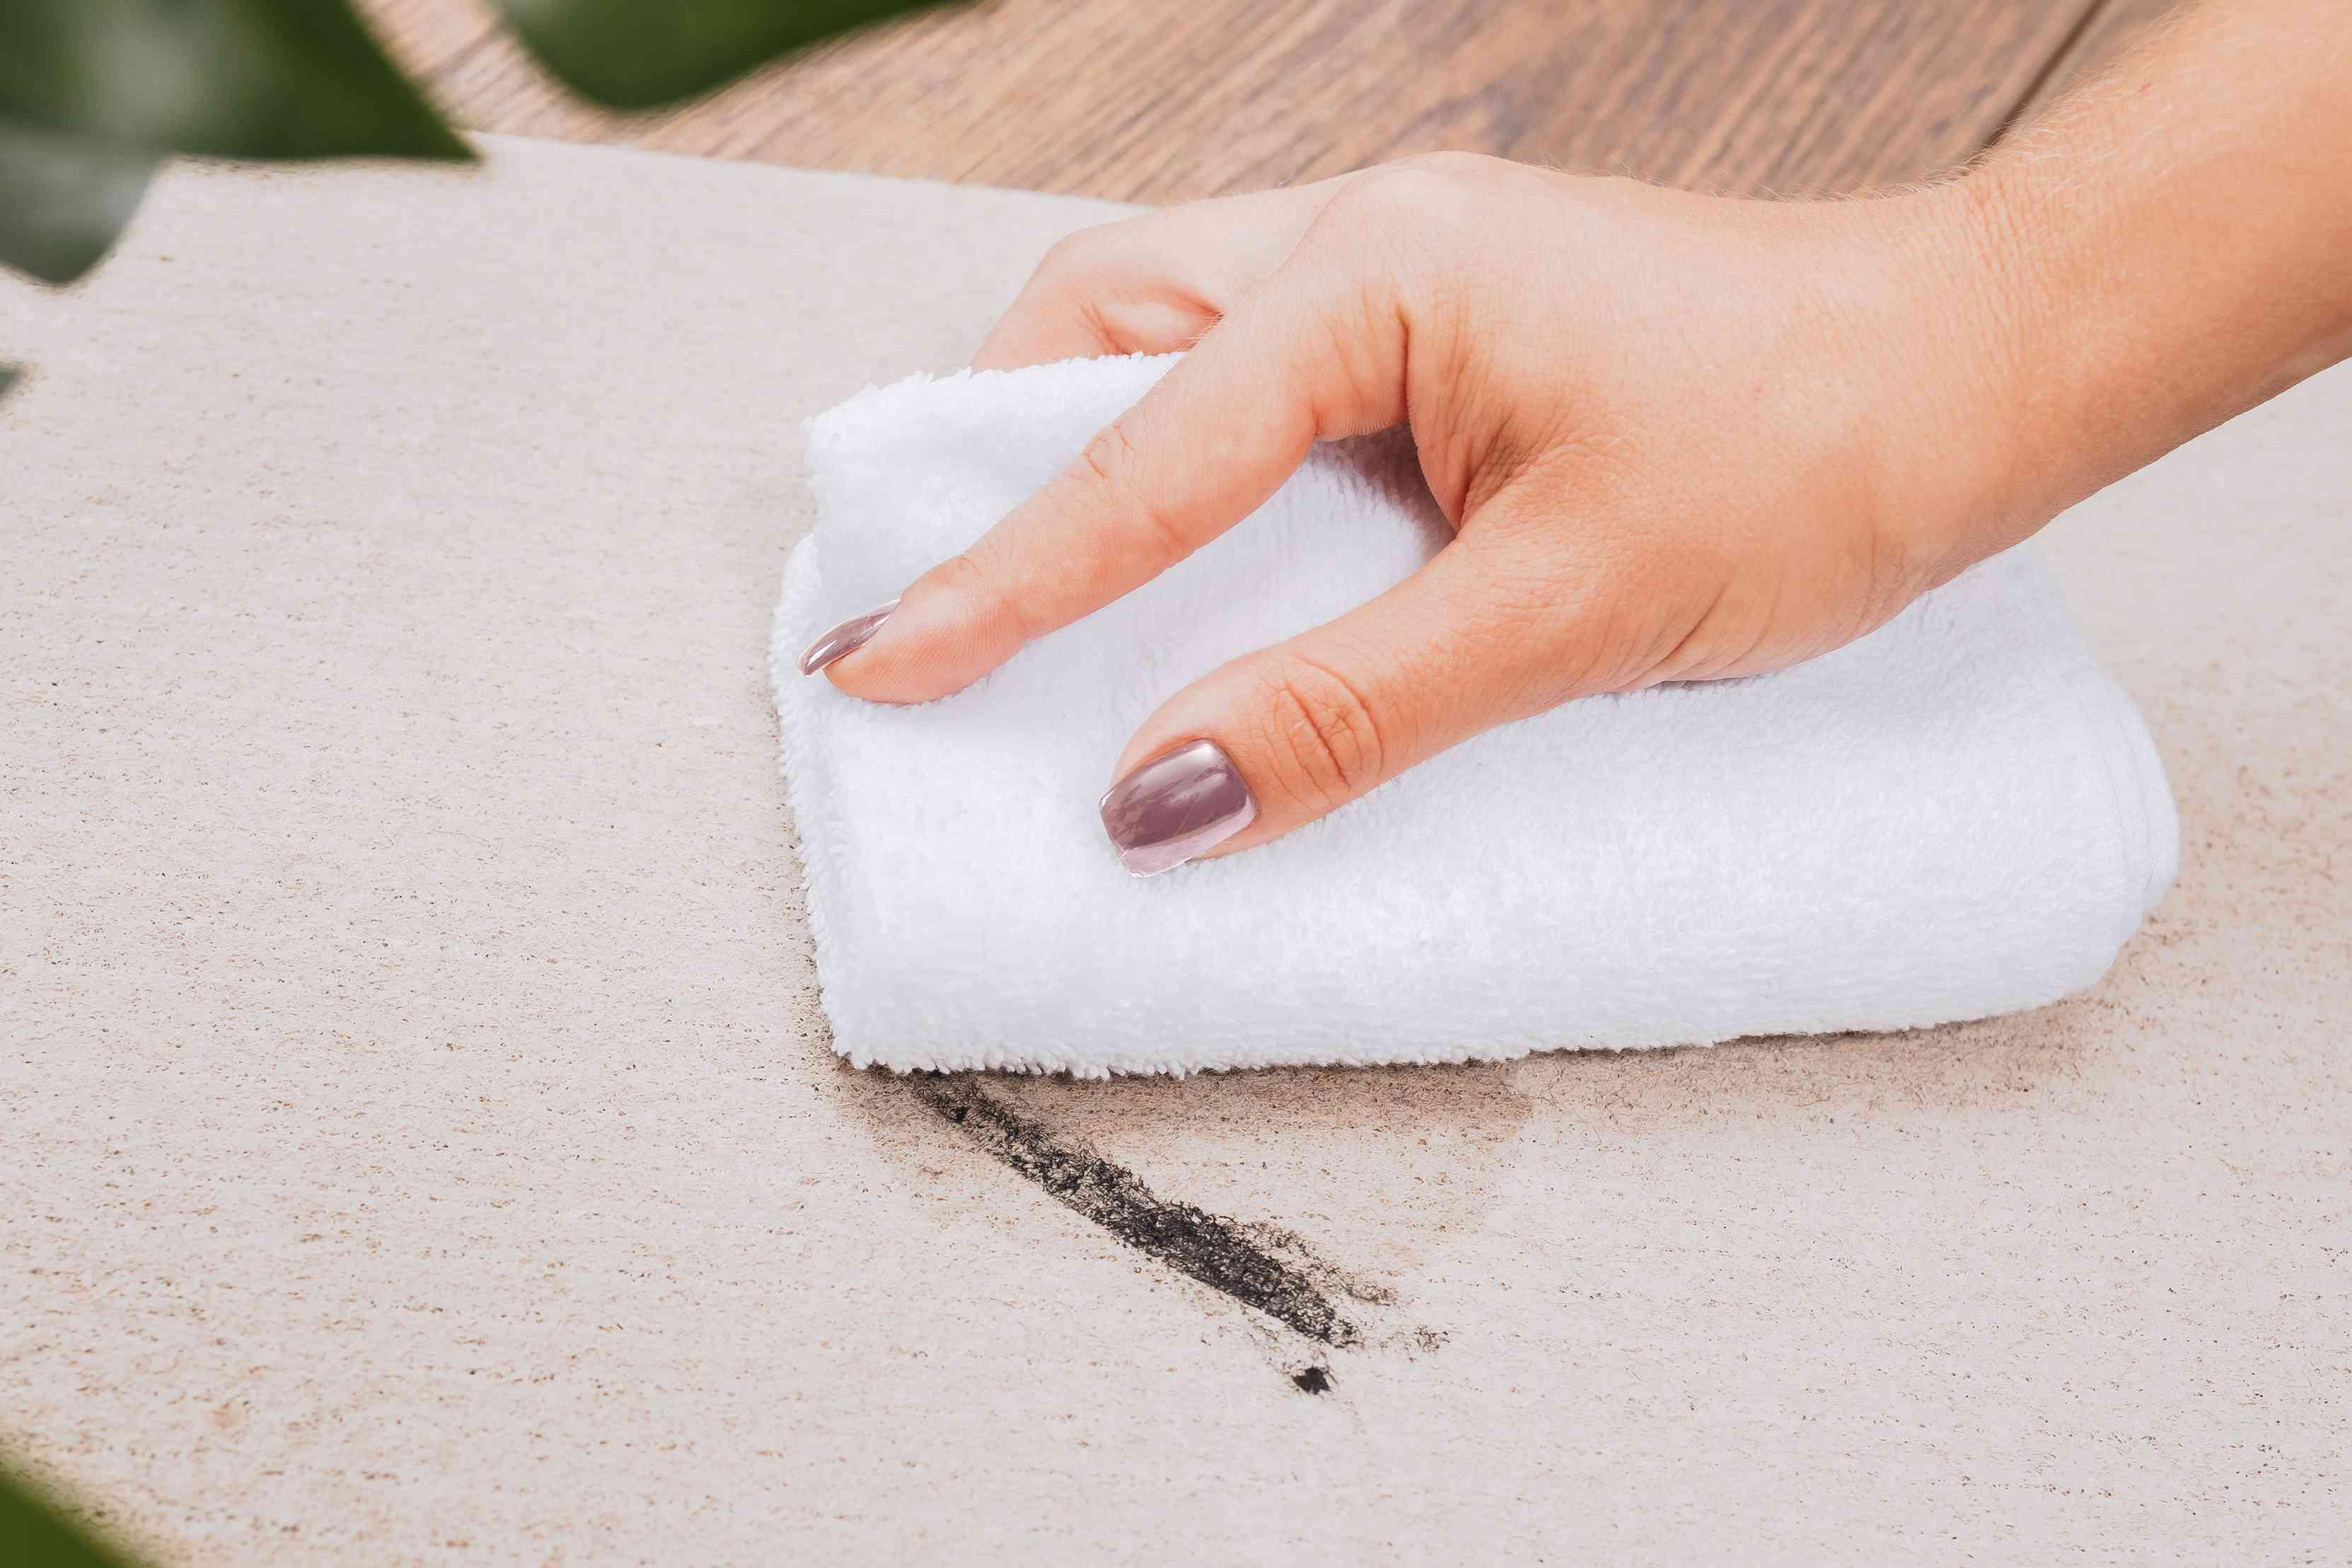 blotting mascara stains from carpet